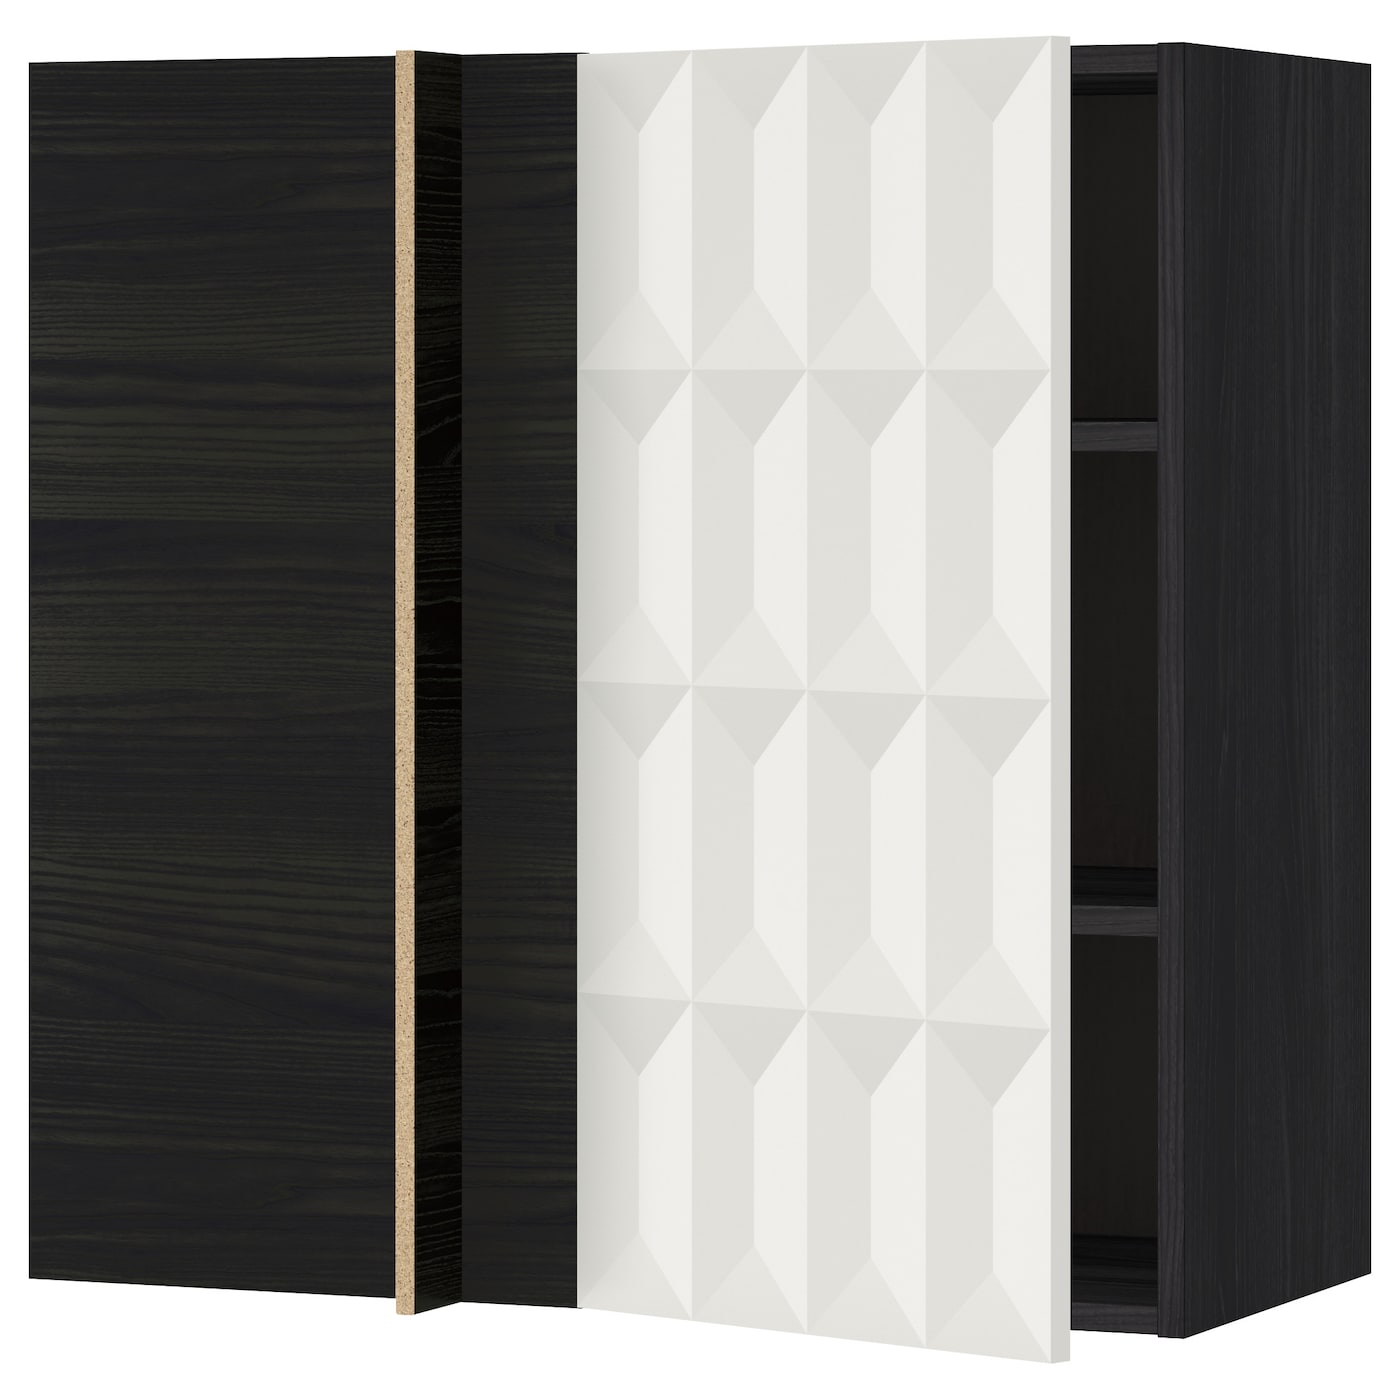 Metod Corner Wall Cabinet With Shelves Black Herrestad